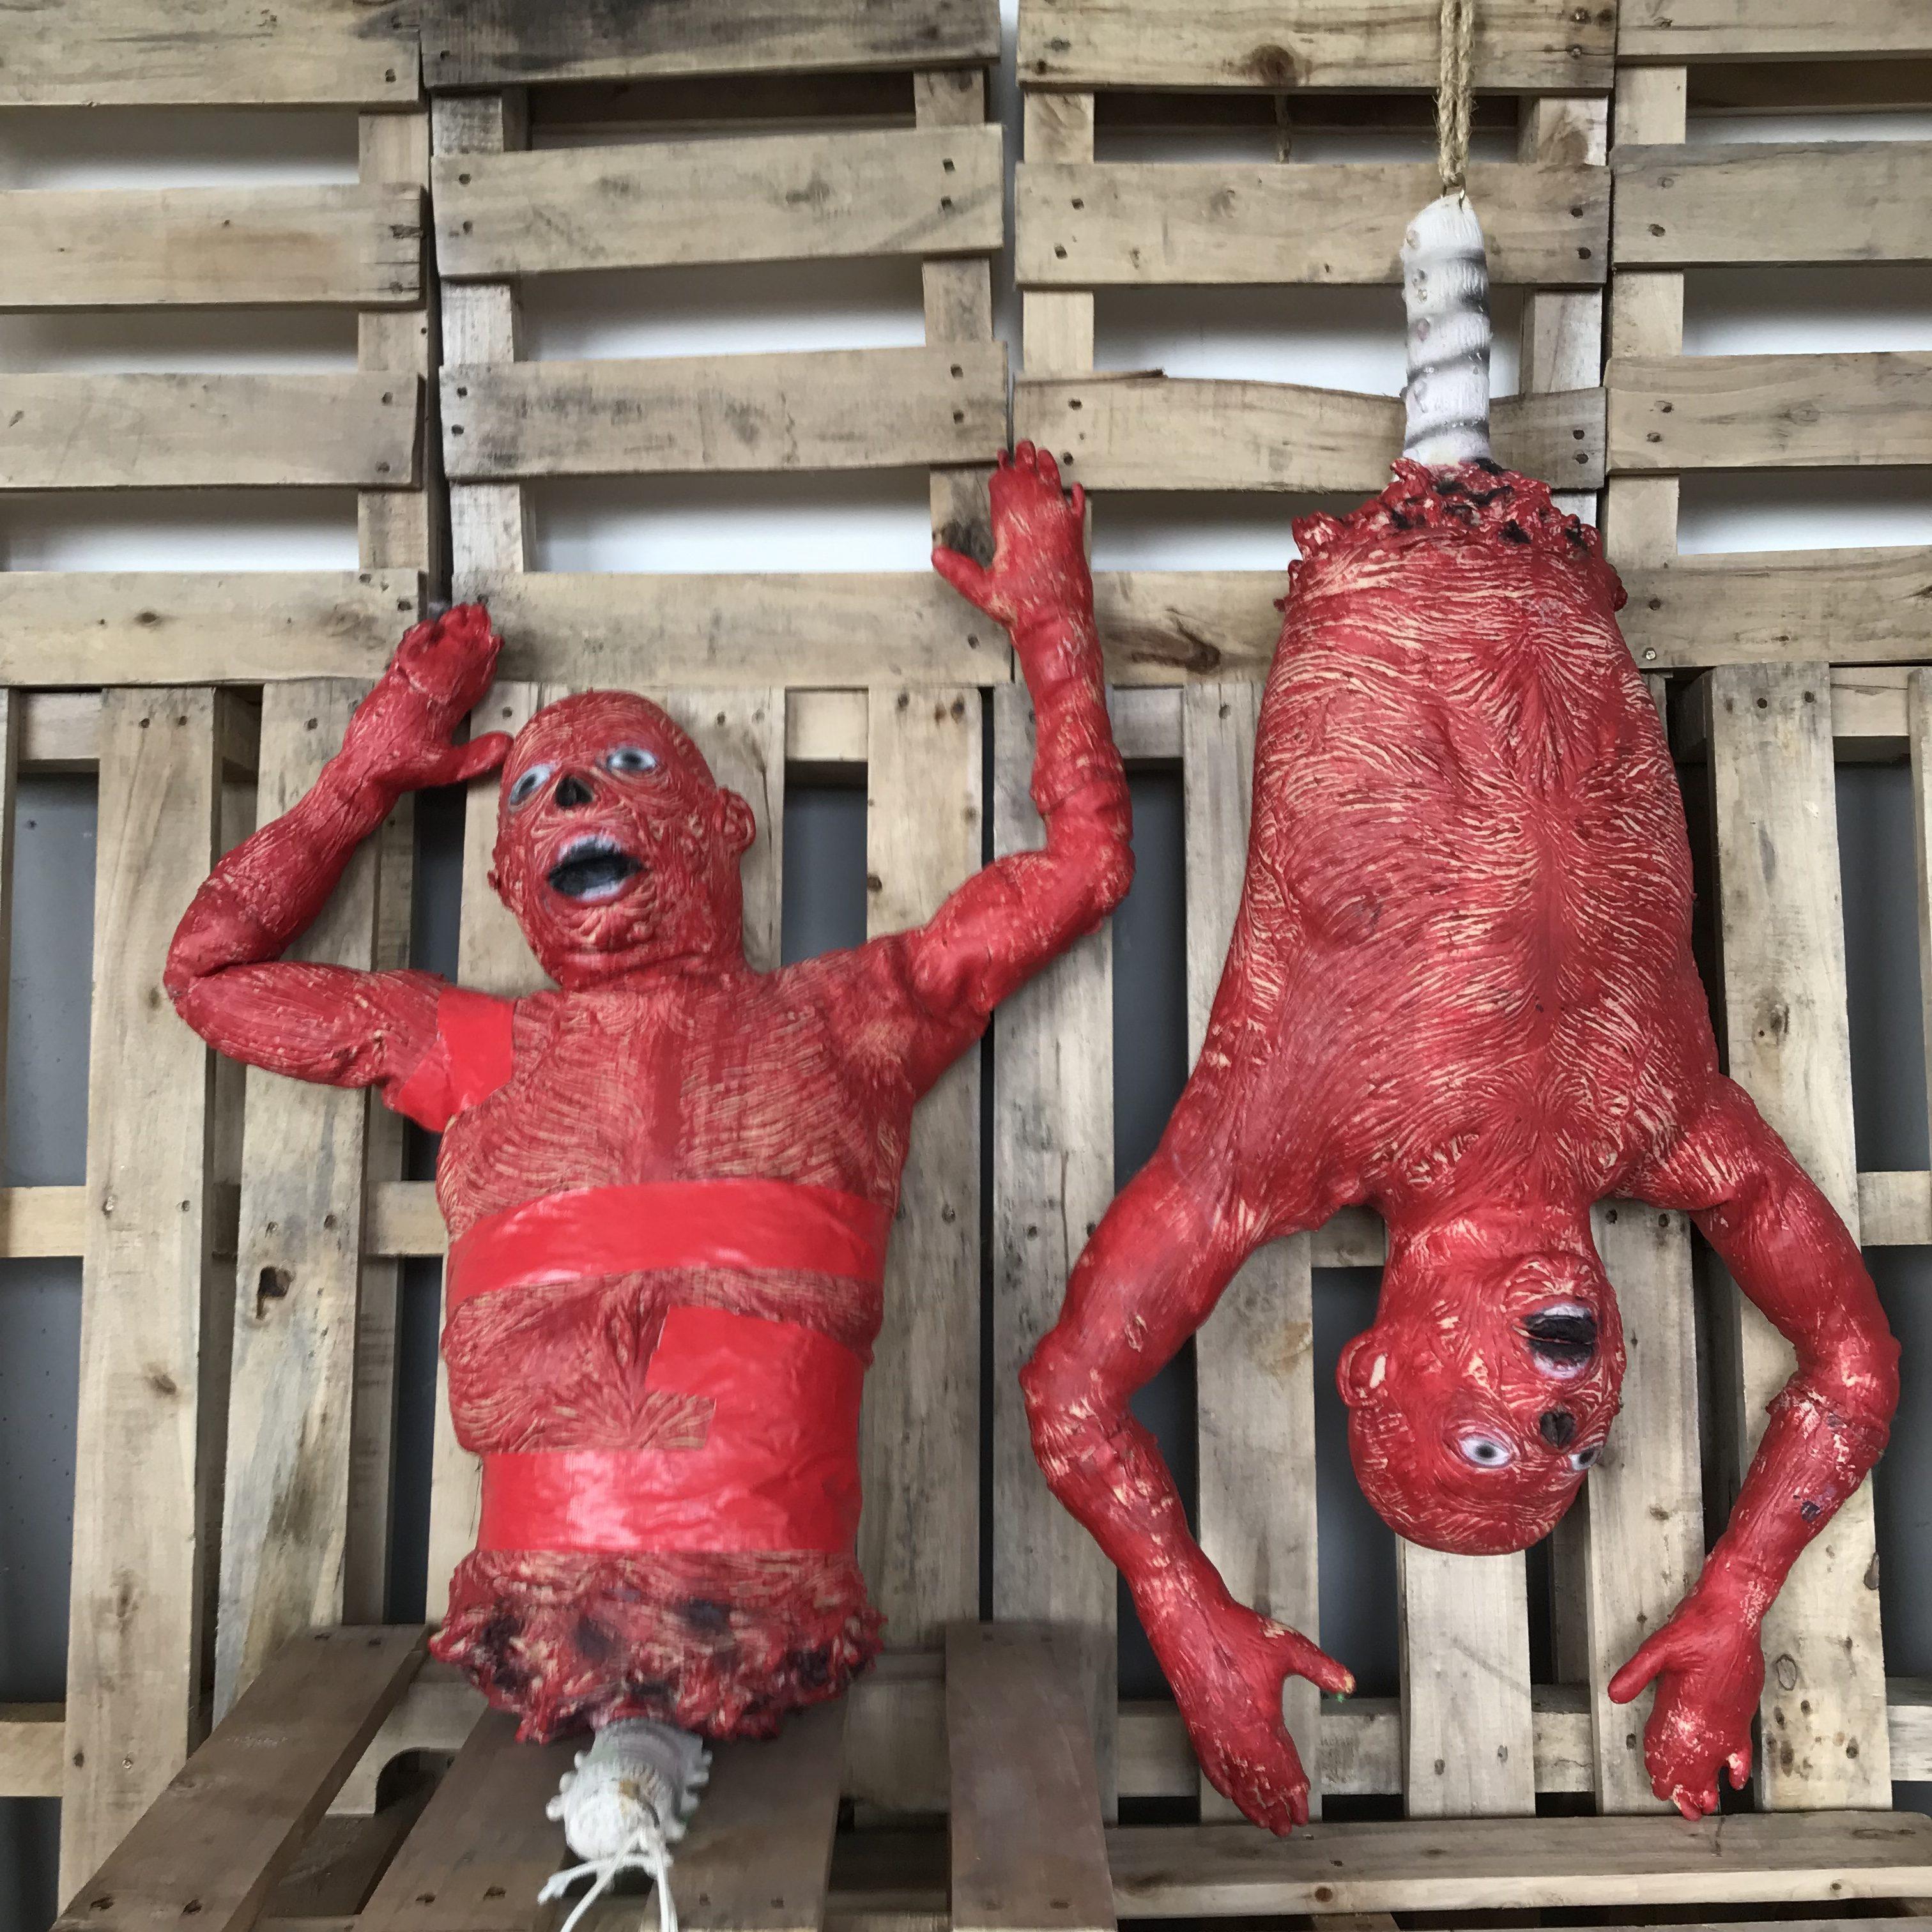 singapore-event-management-halloween-props-rental-burnt-bodies